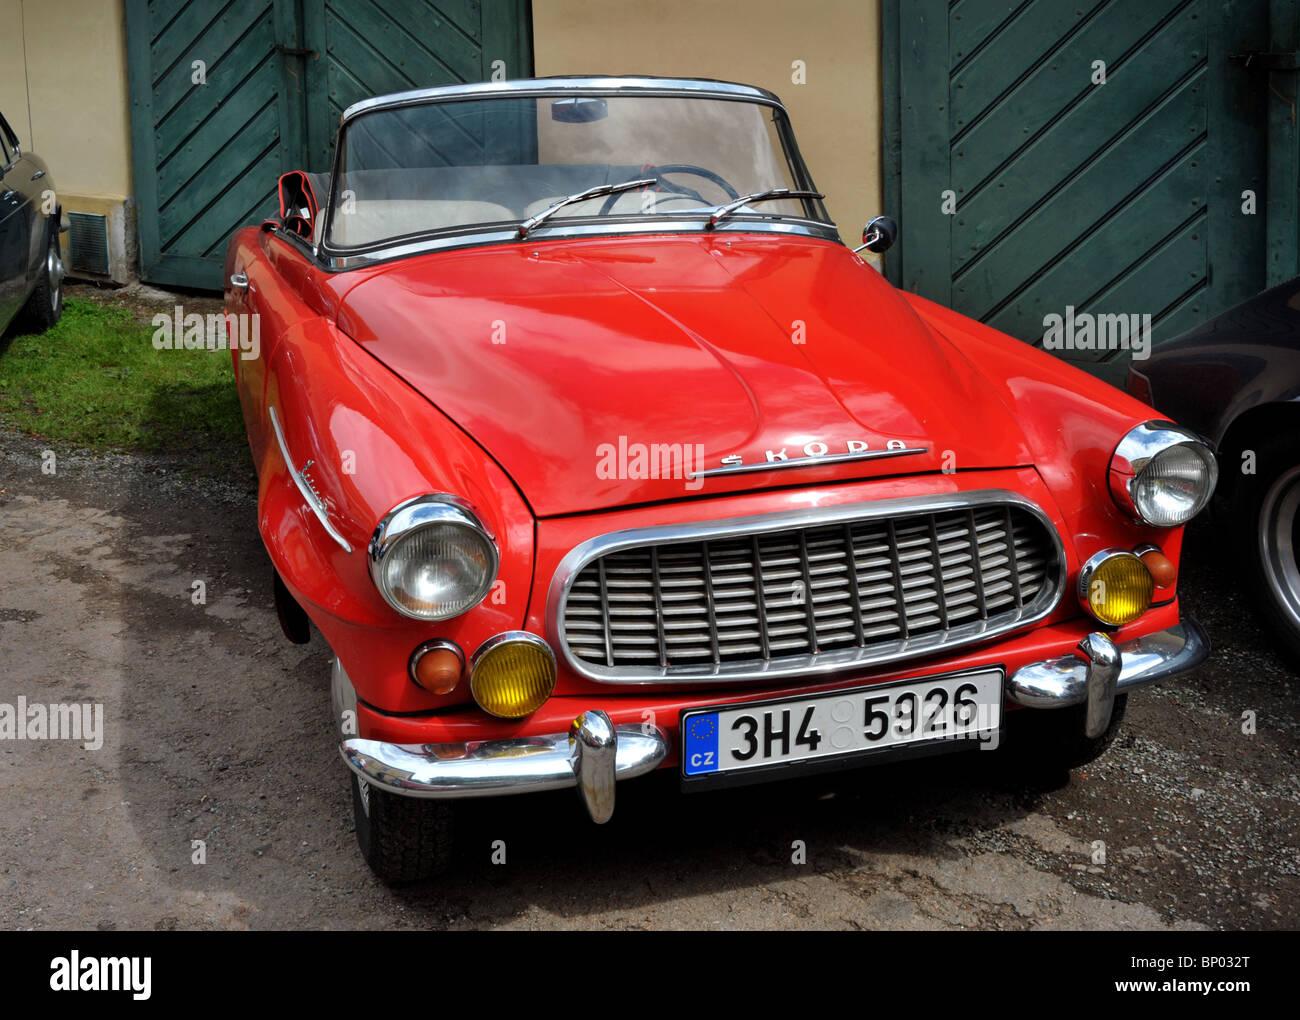 Vintage car Skoda Felicia - Stock Image